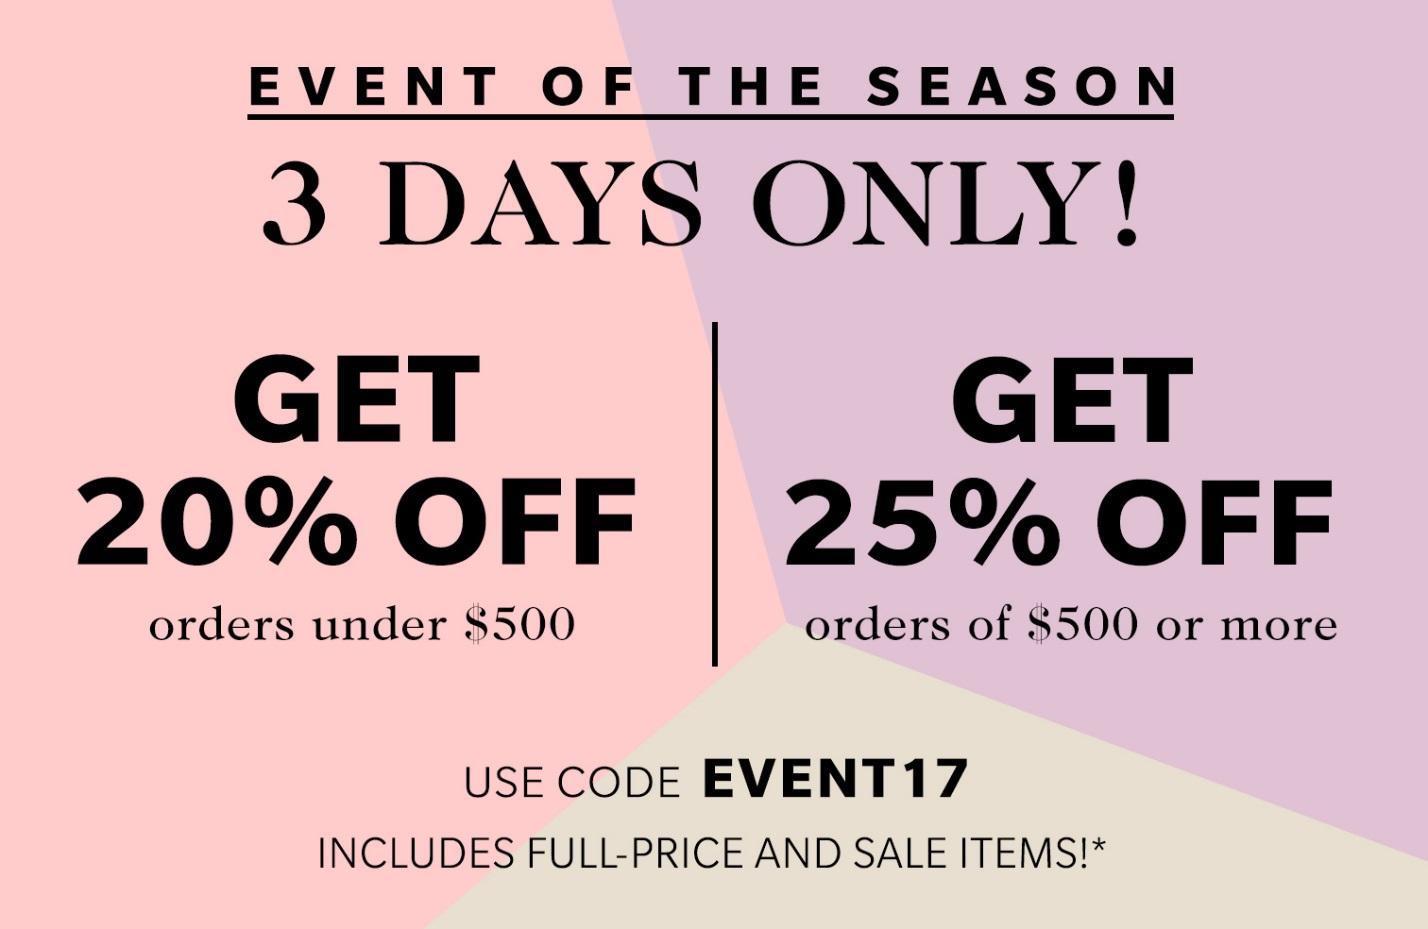 Shopbop Event of the Season Sale